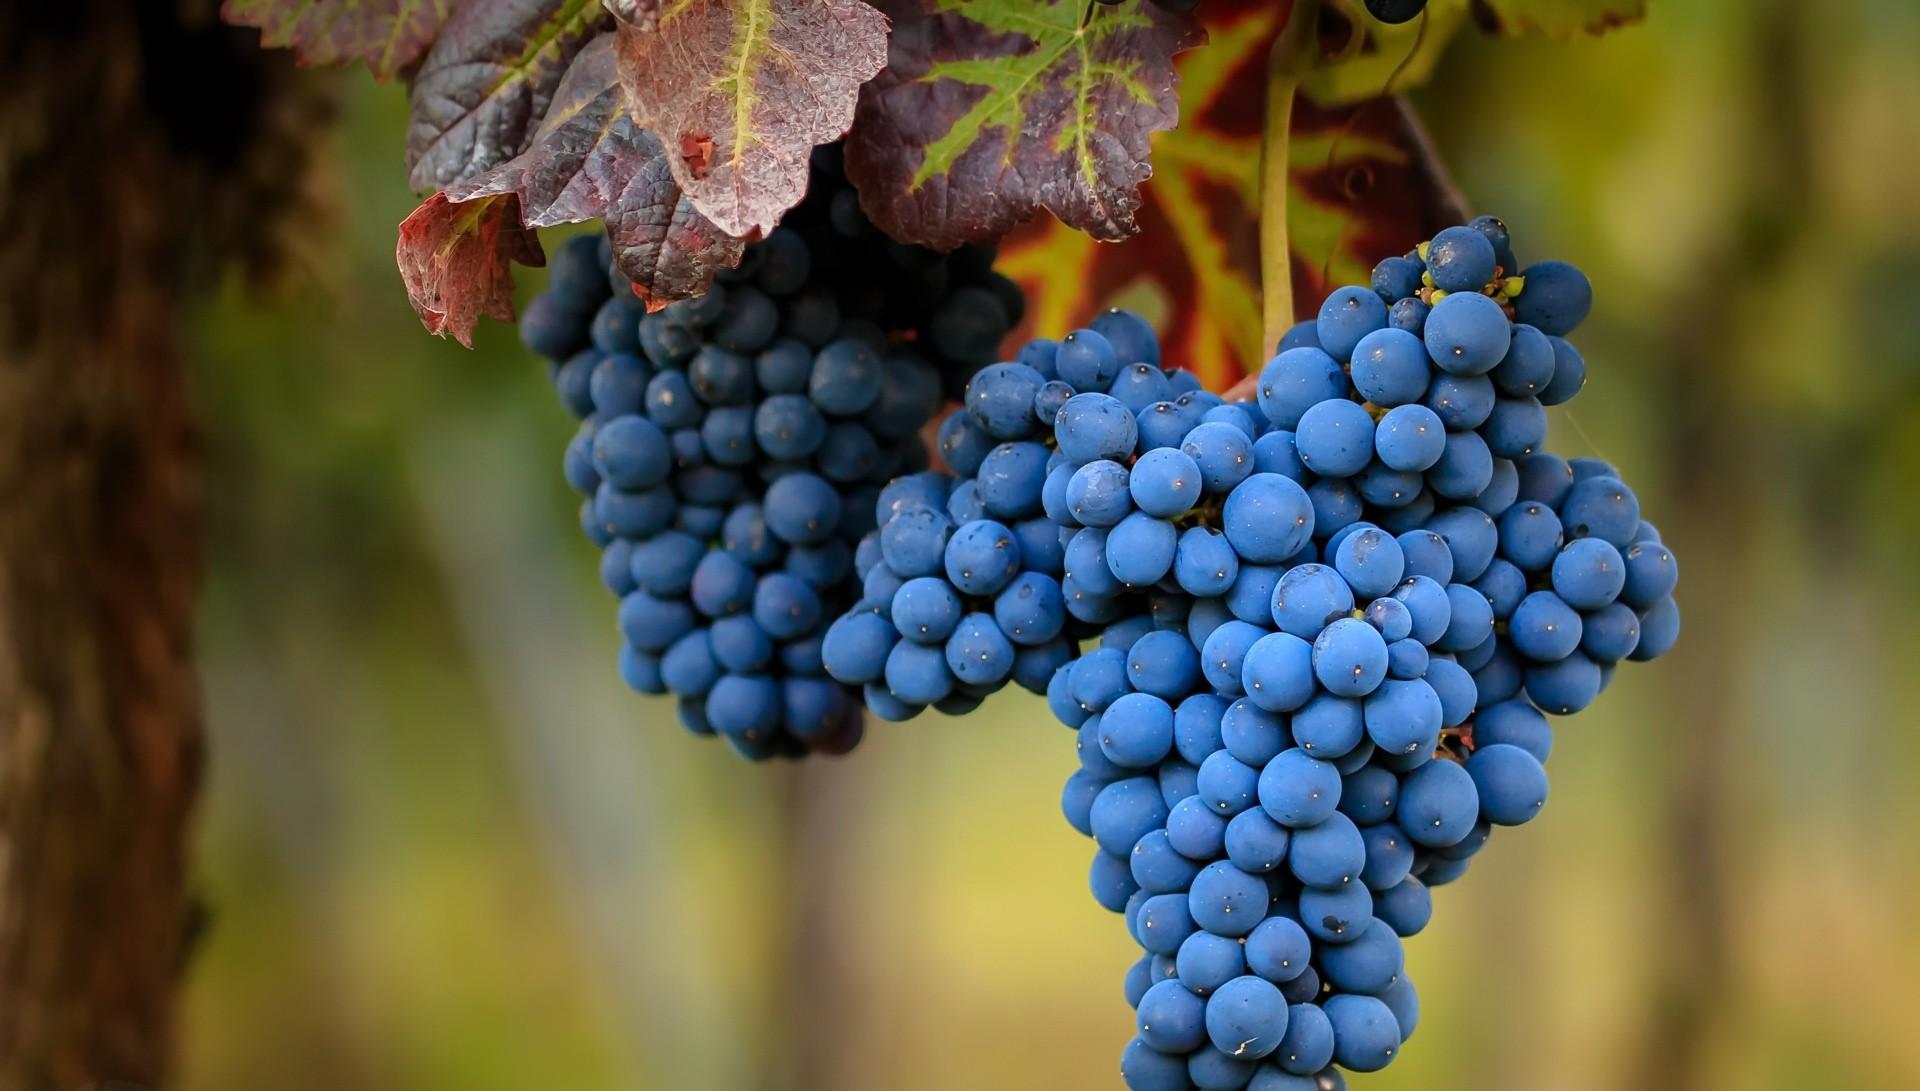 Картинки про виноград, 81+ красивые